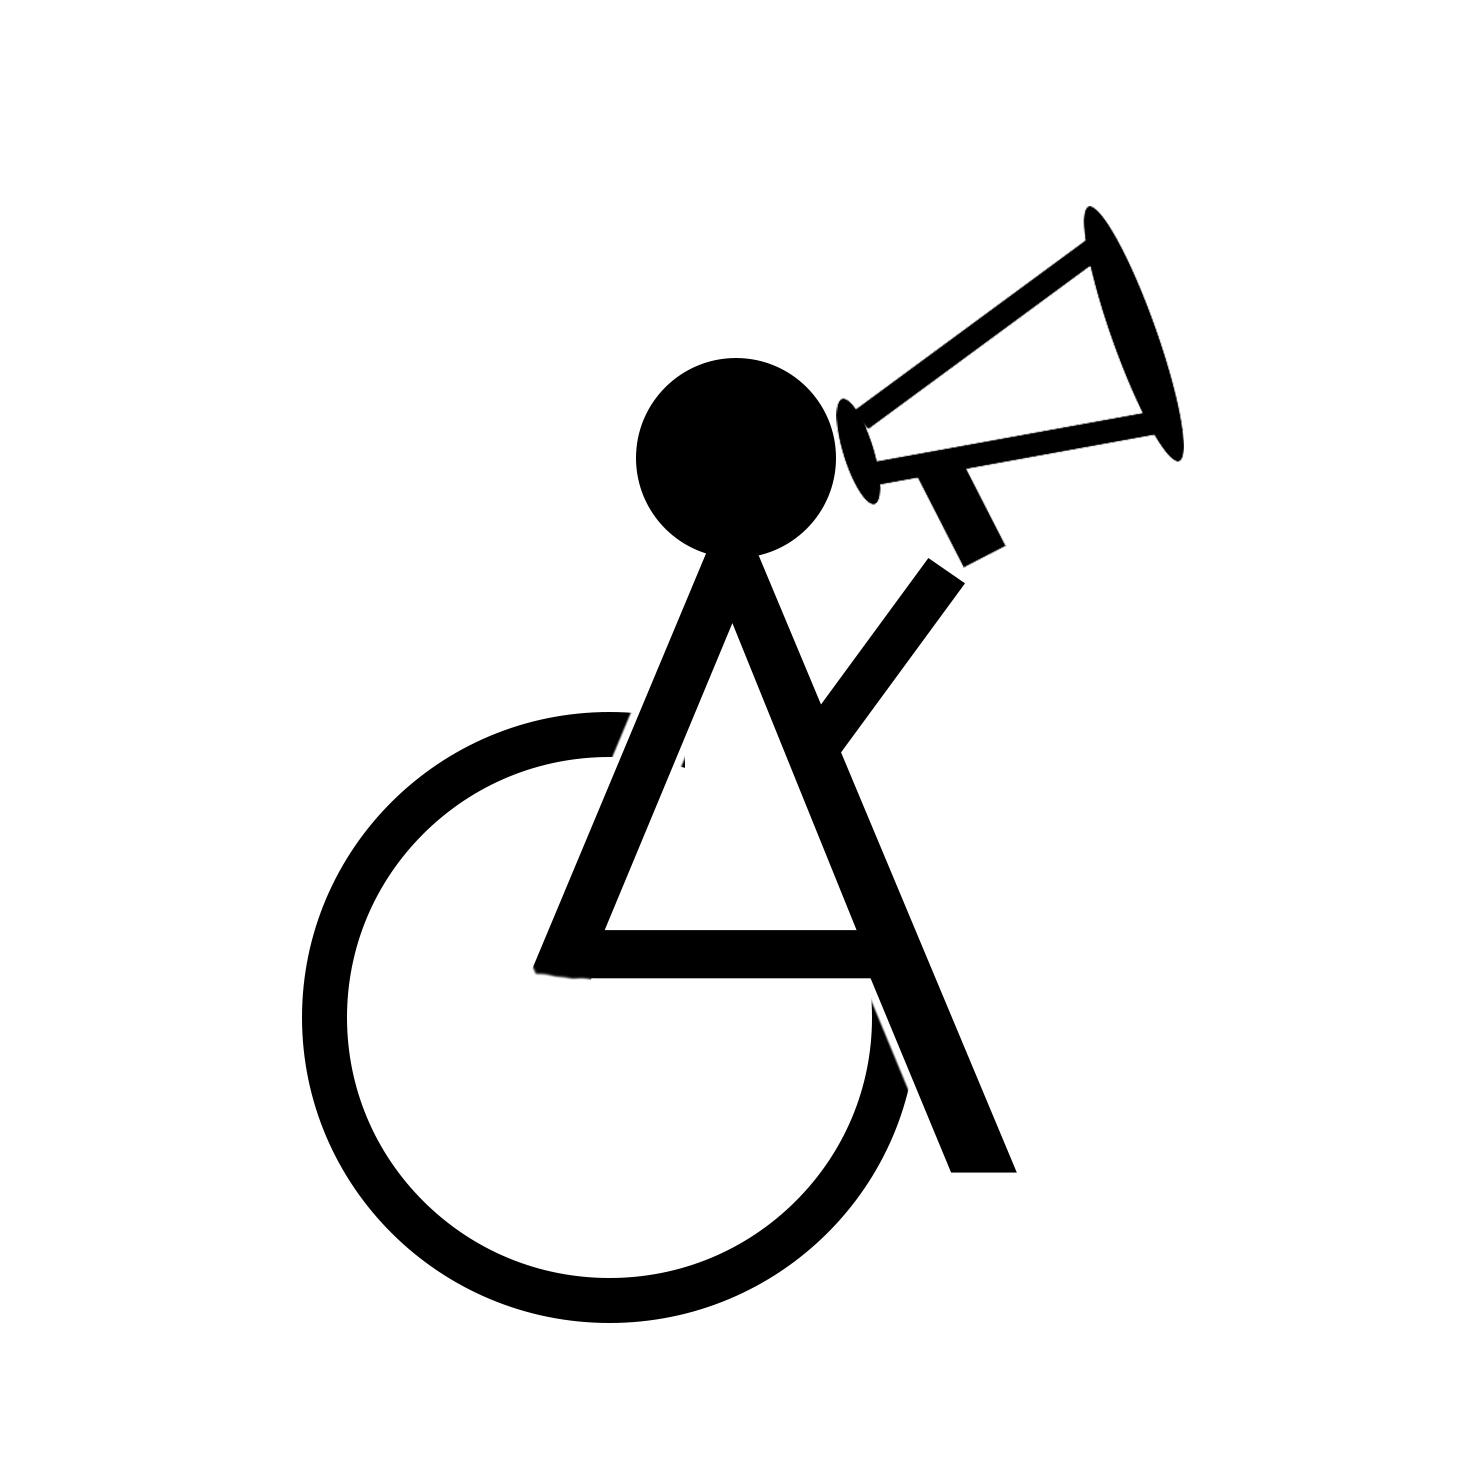 logo 2 square.png